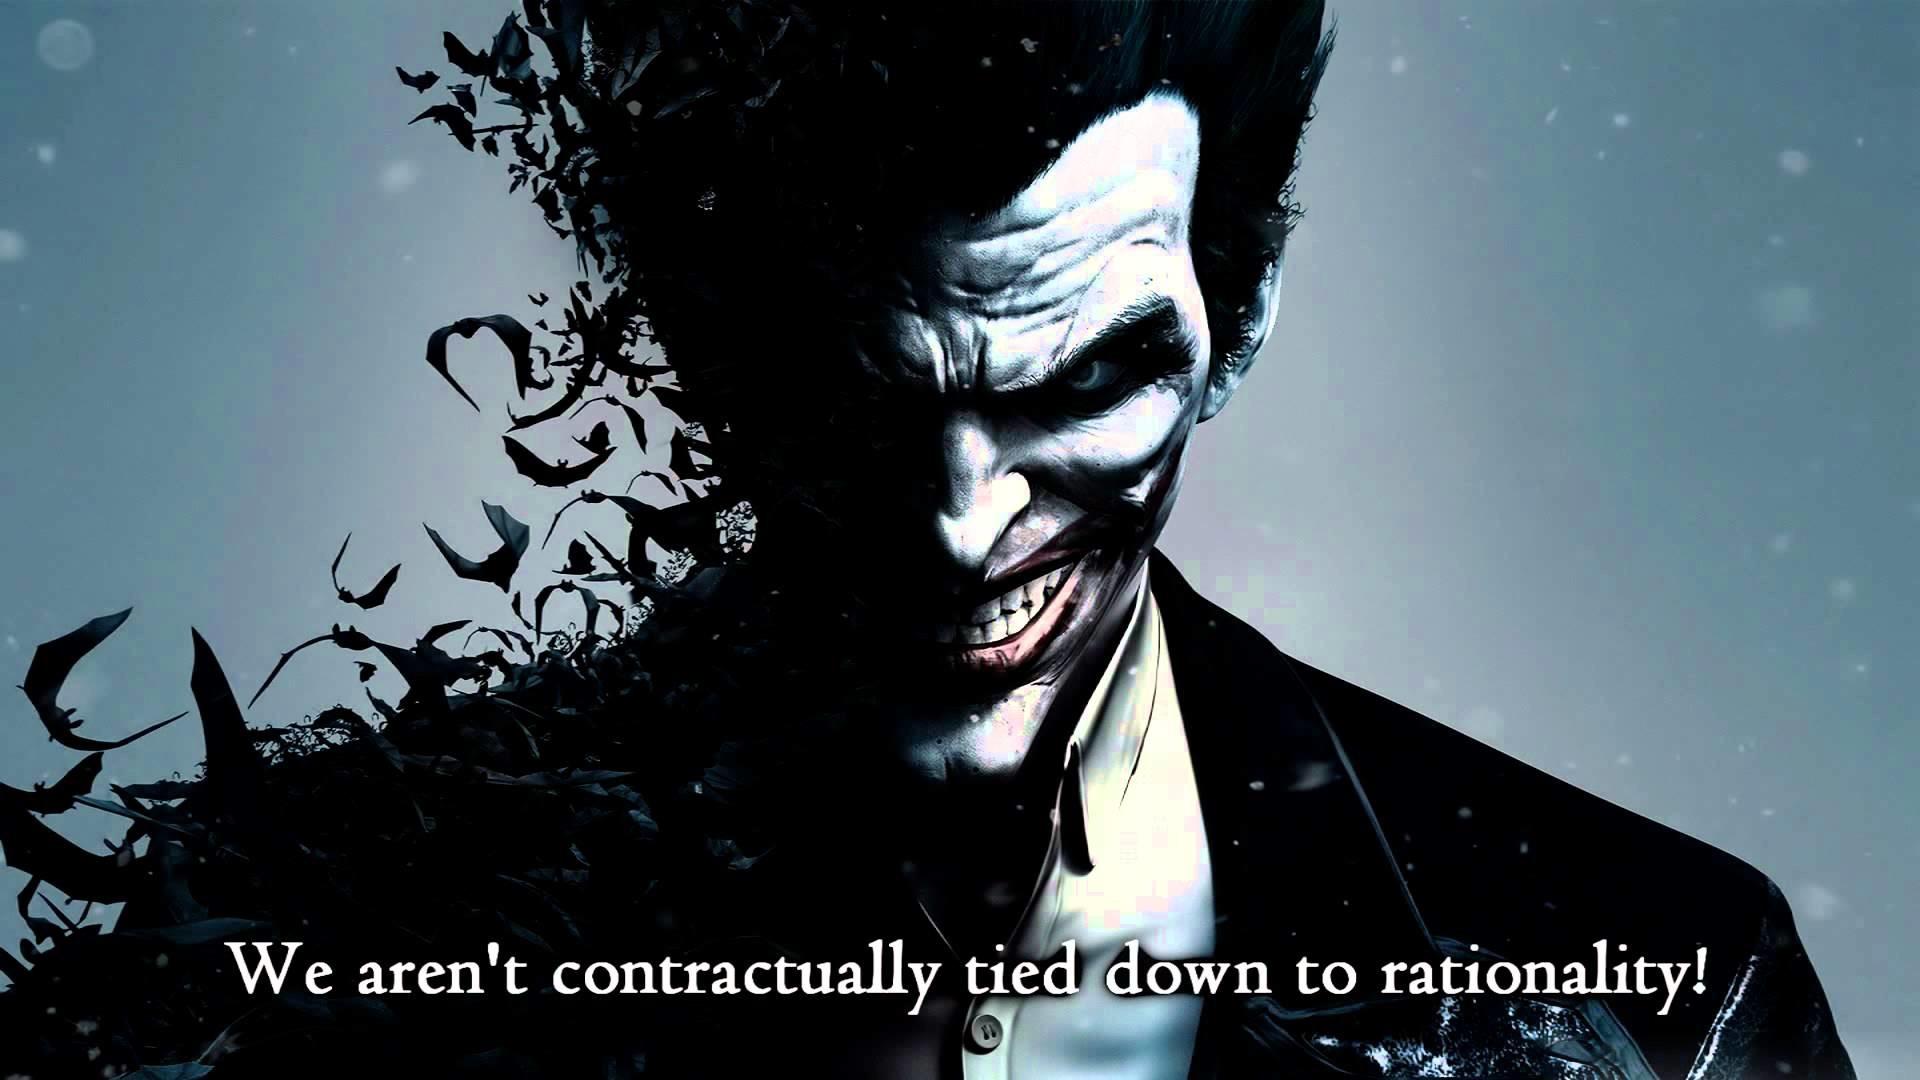 [THE JOKER] The Killing Joke Monologue by Christian Sekhanan – YouTube